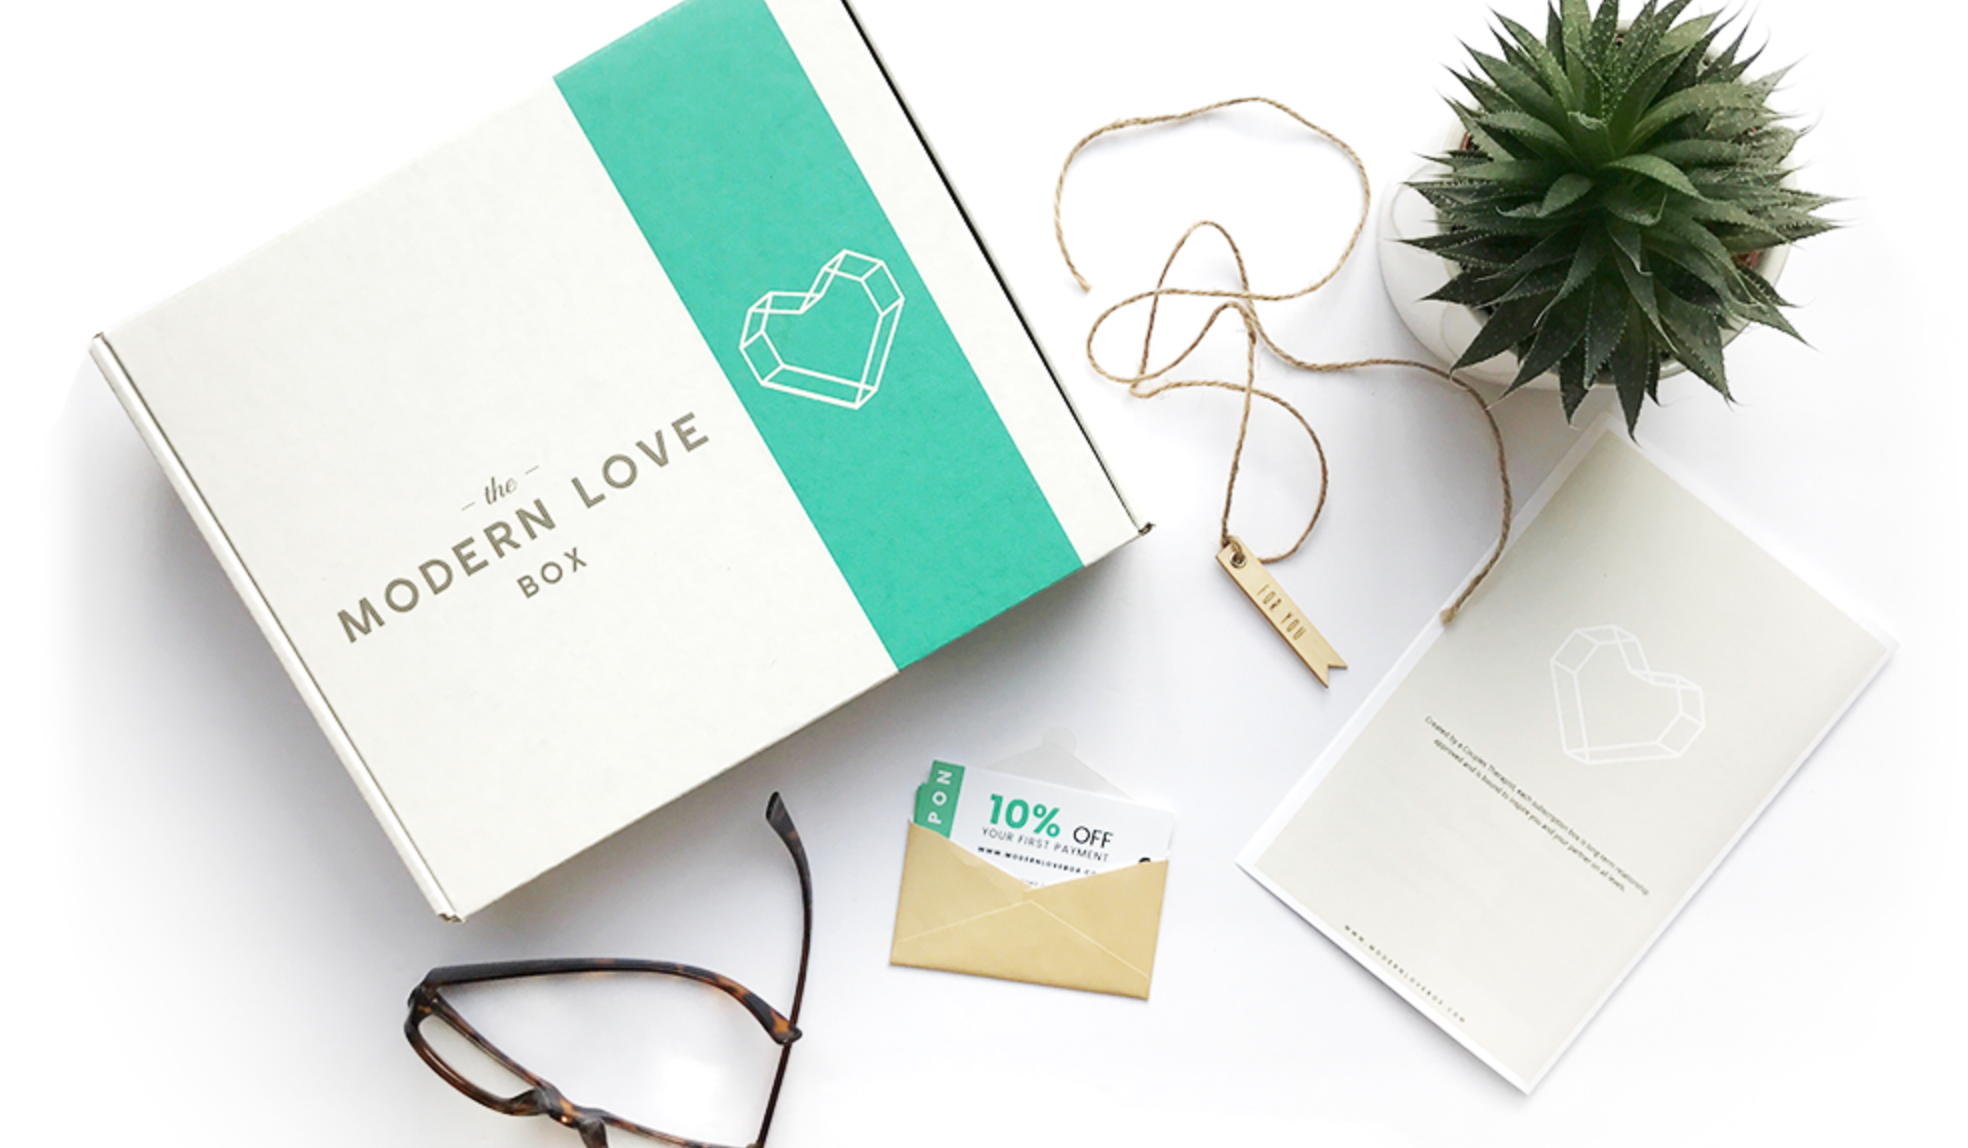 The Modern Love Box